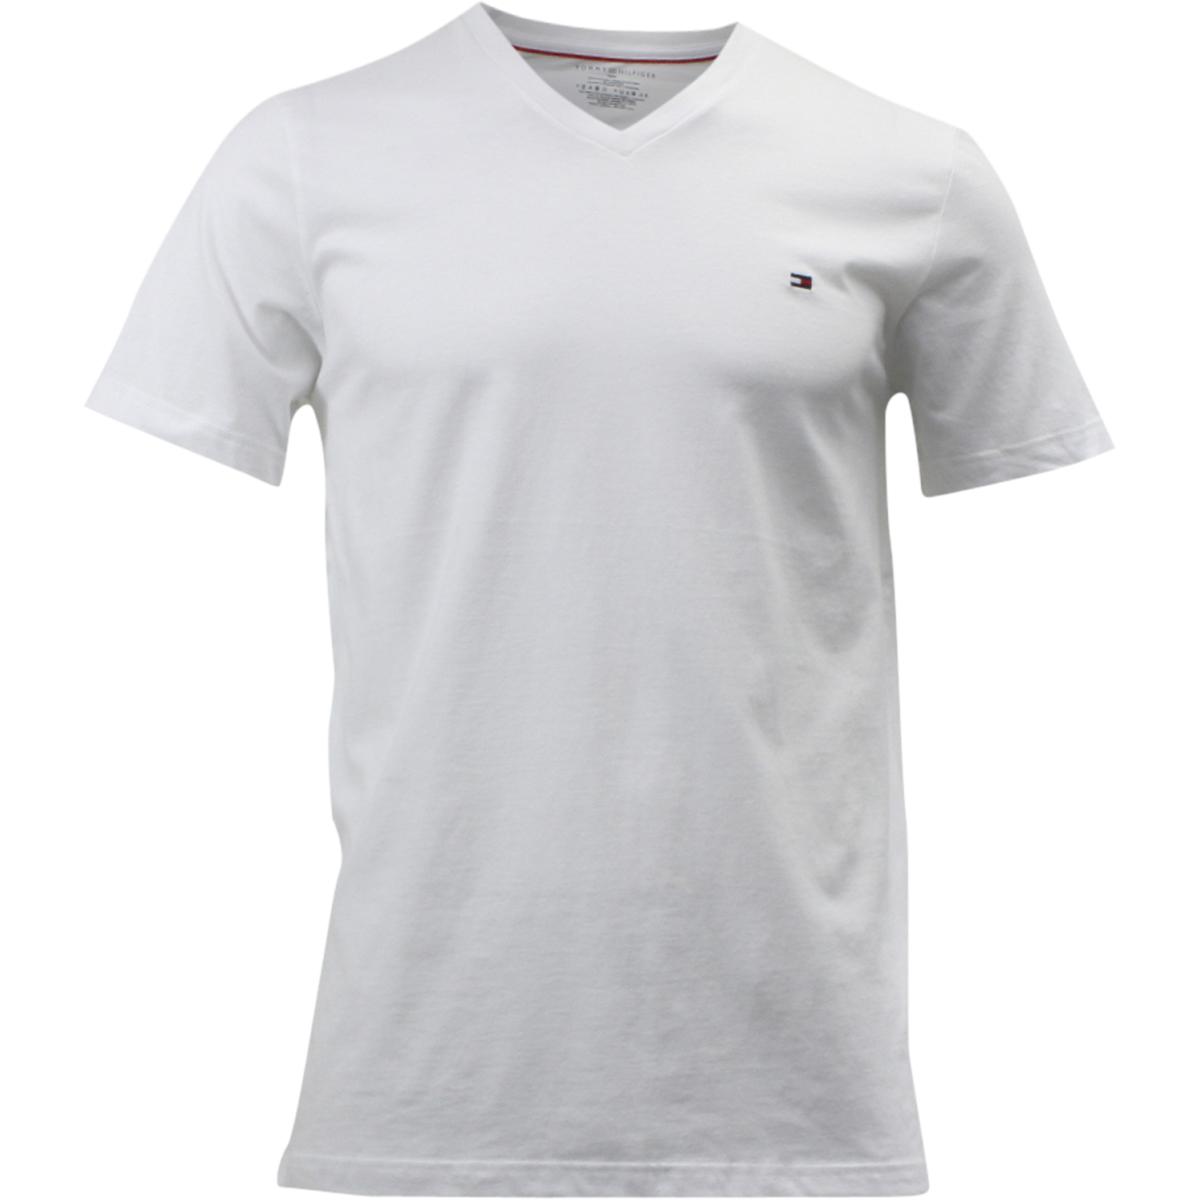 c1b265737 Tommy Hilfiger Men's Core Flag Short Sleeve V-Neck White Cotton T ...